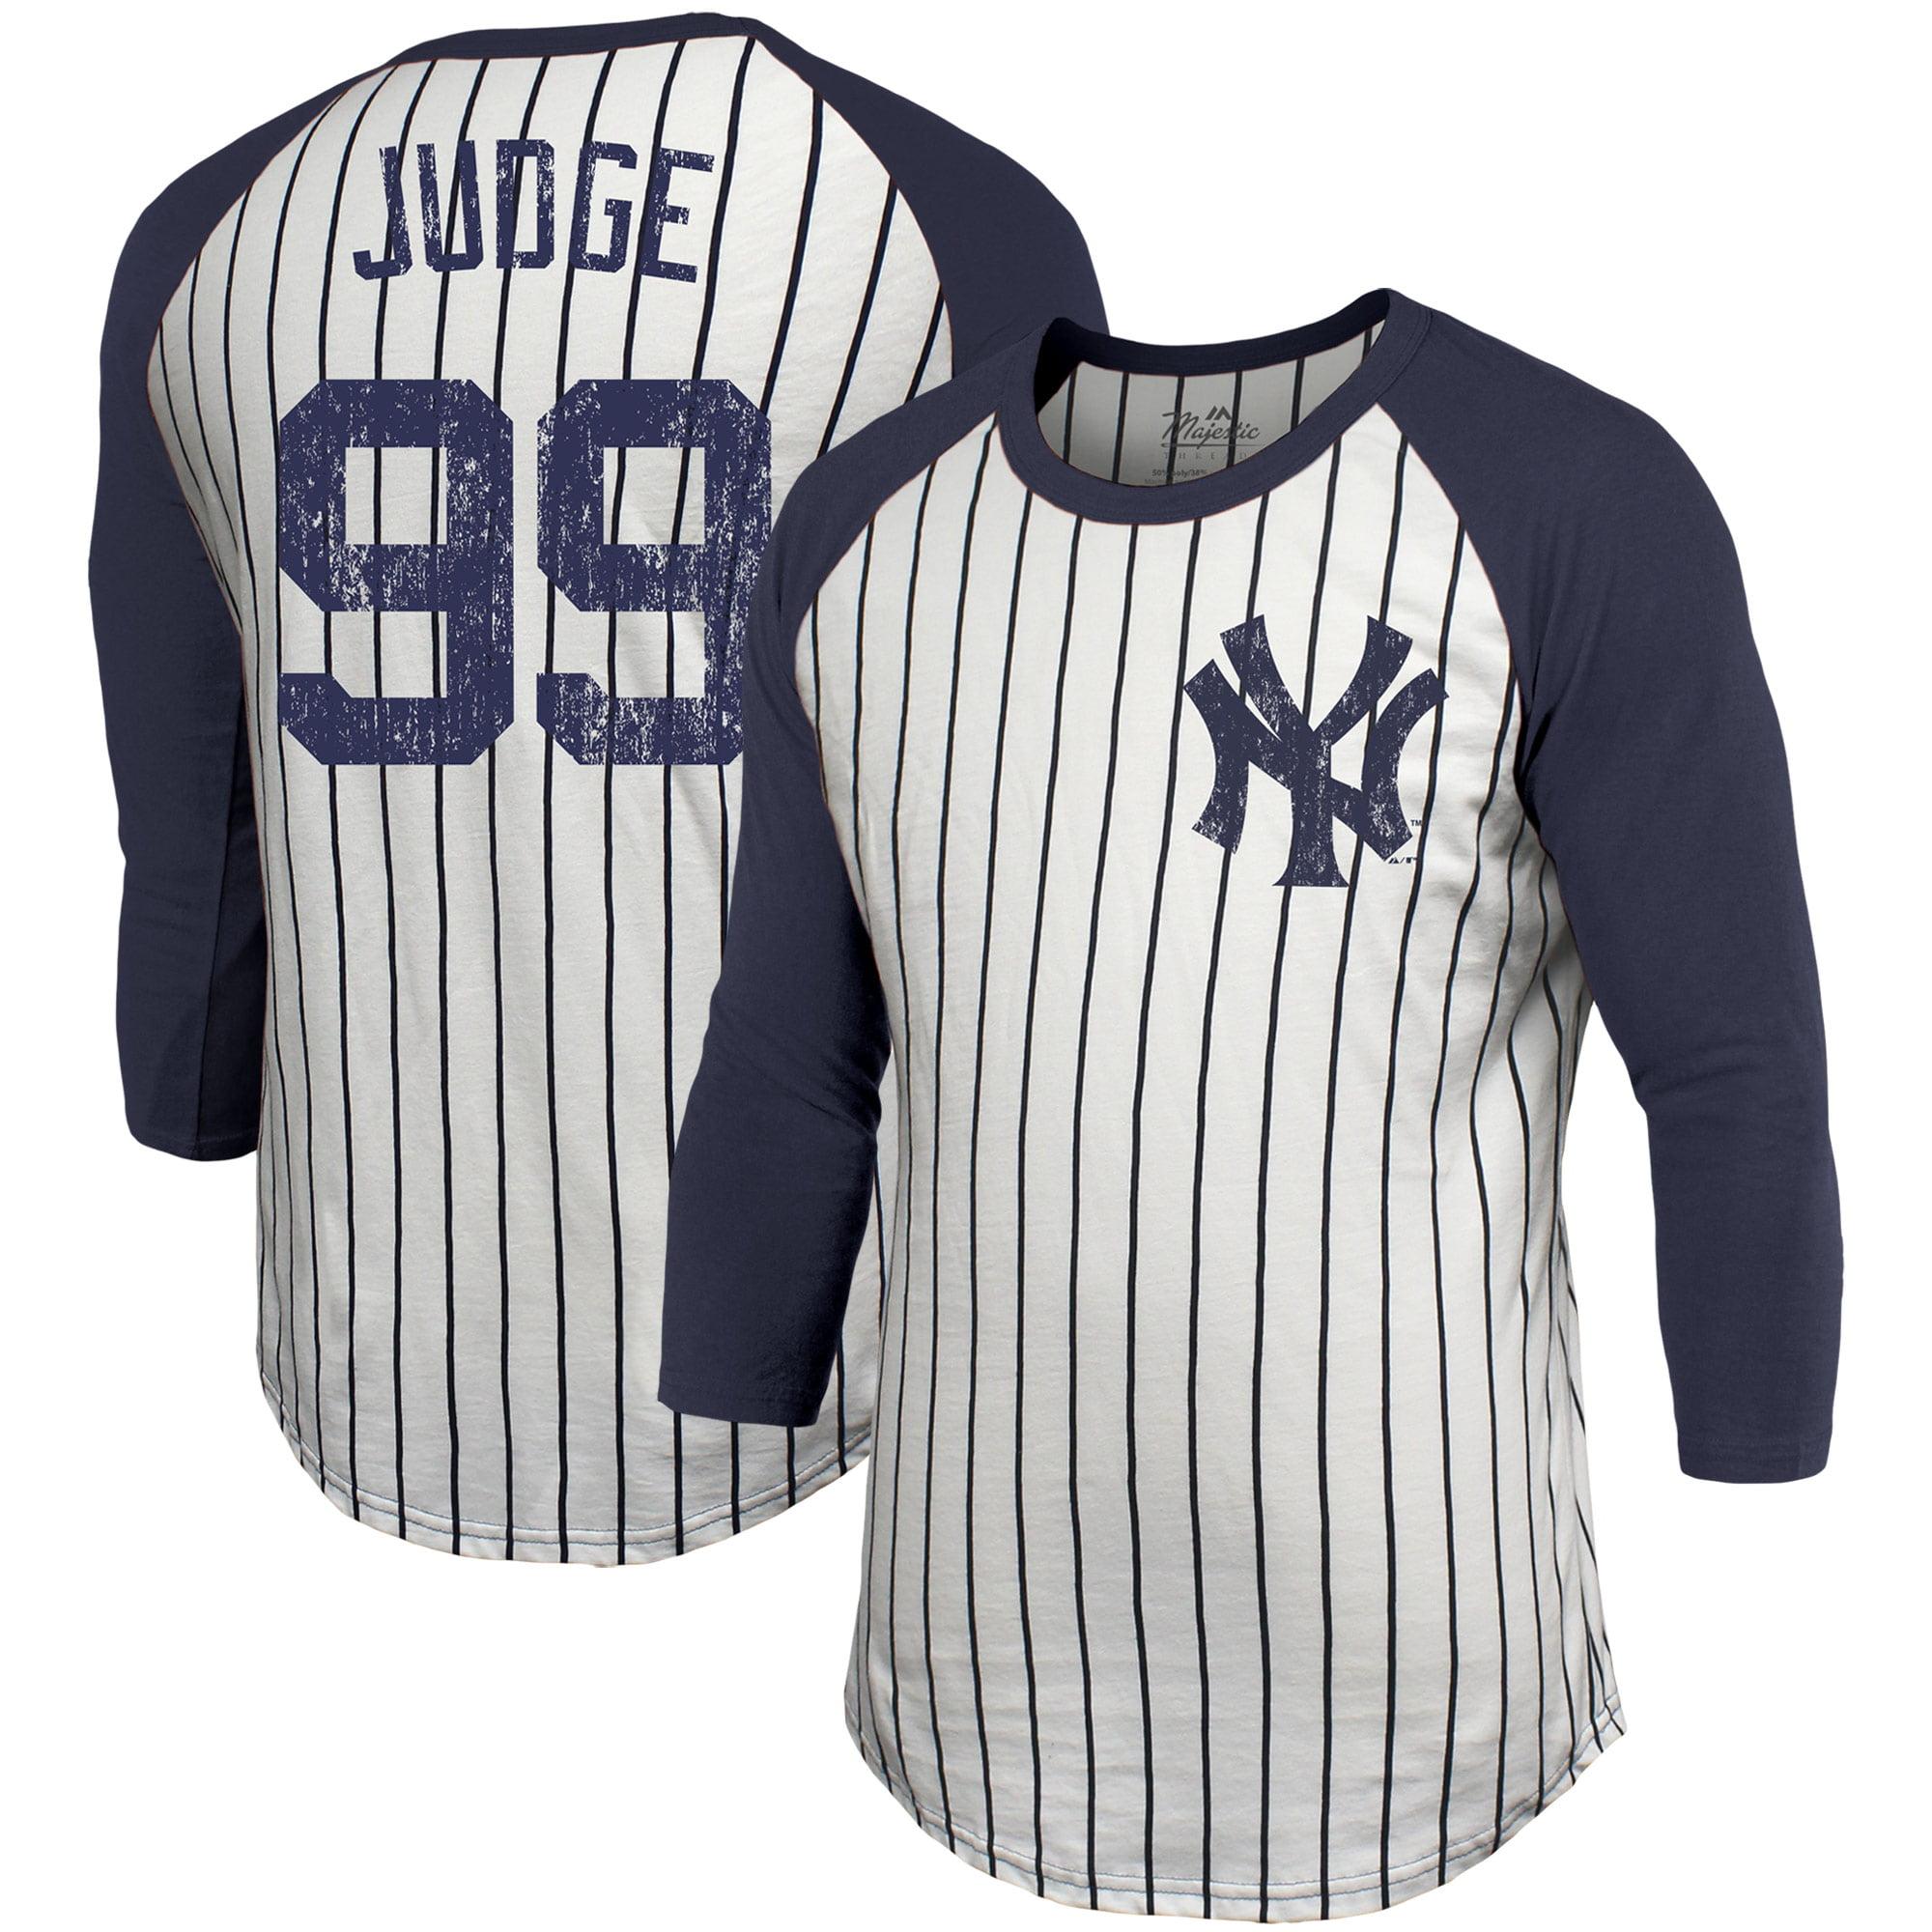 reputable site 9cffd aca1b Aaron Judge New York Yankees Majestic Threads Pinstripe 3/4-Sleeve Raglan  Name & Number T-Shirt - White